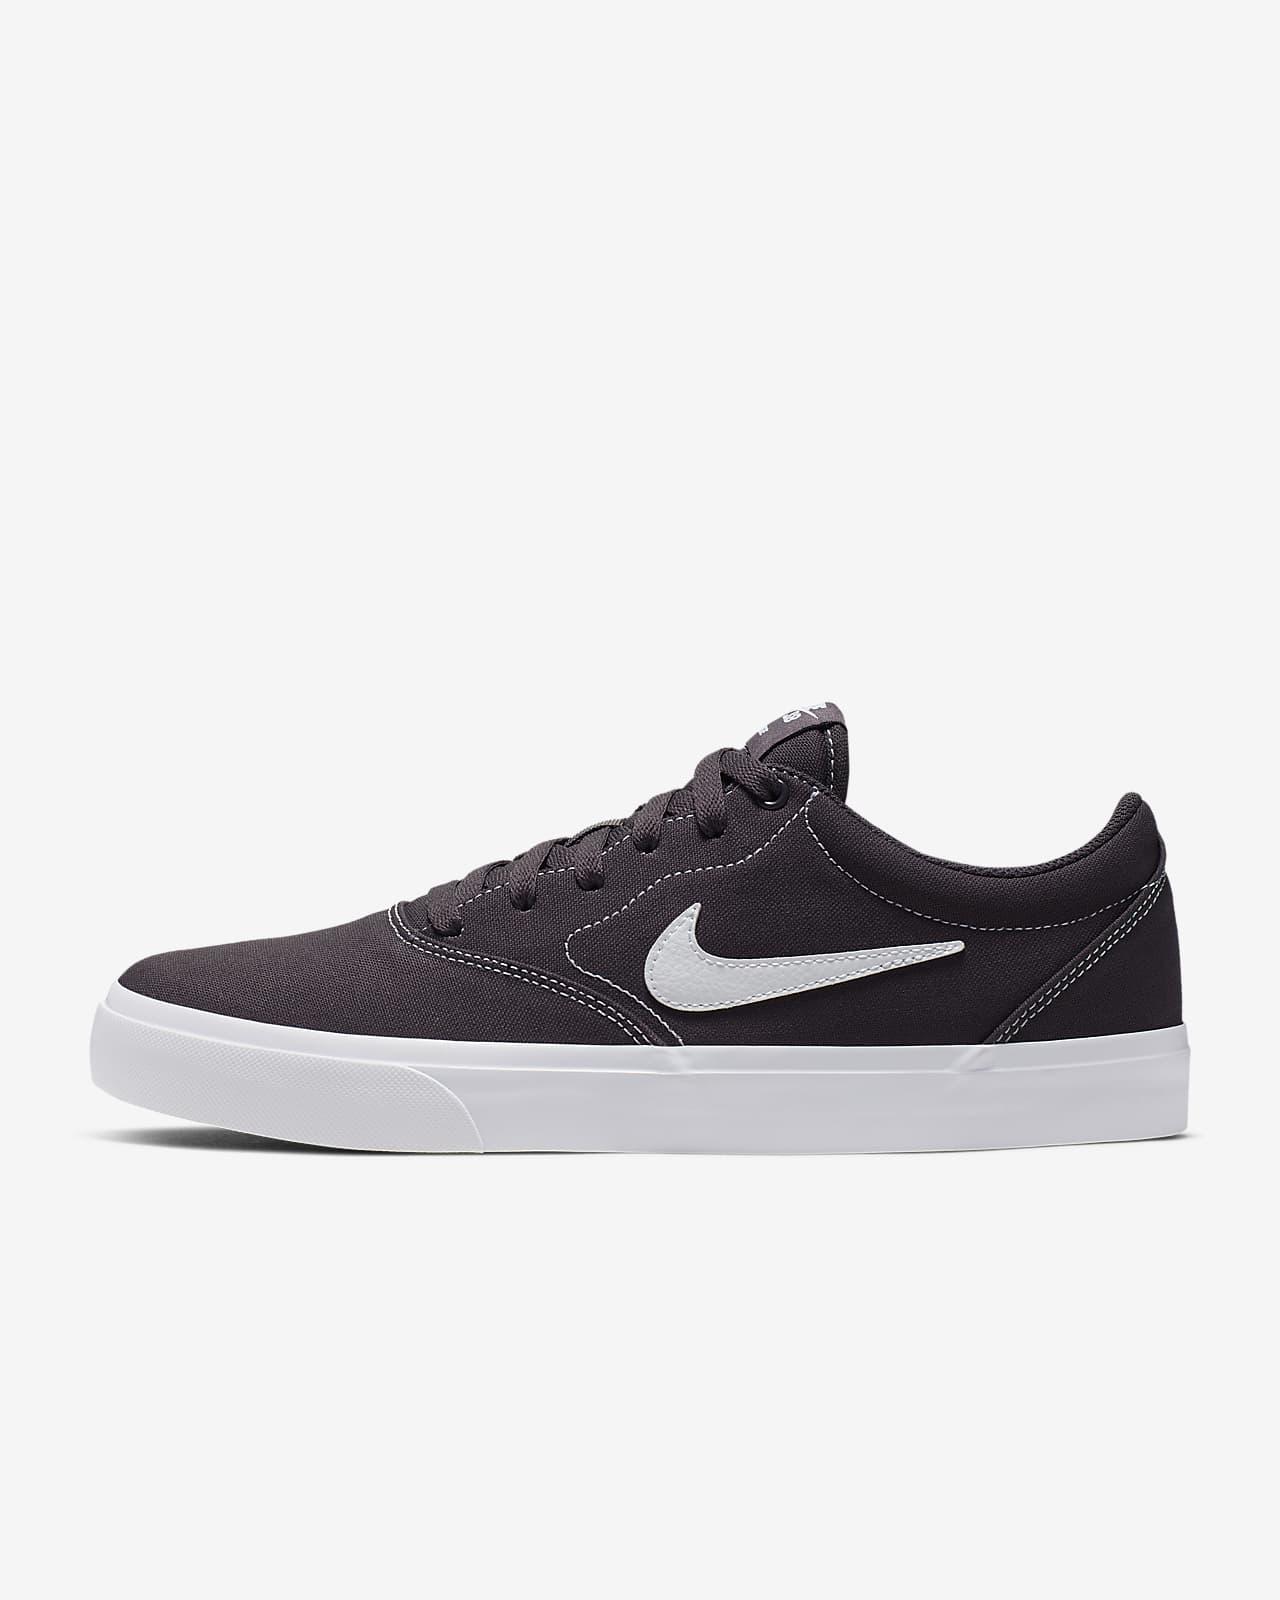 Nike SB Charge Canvas Skate Shoe